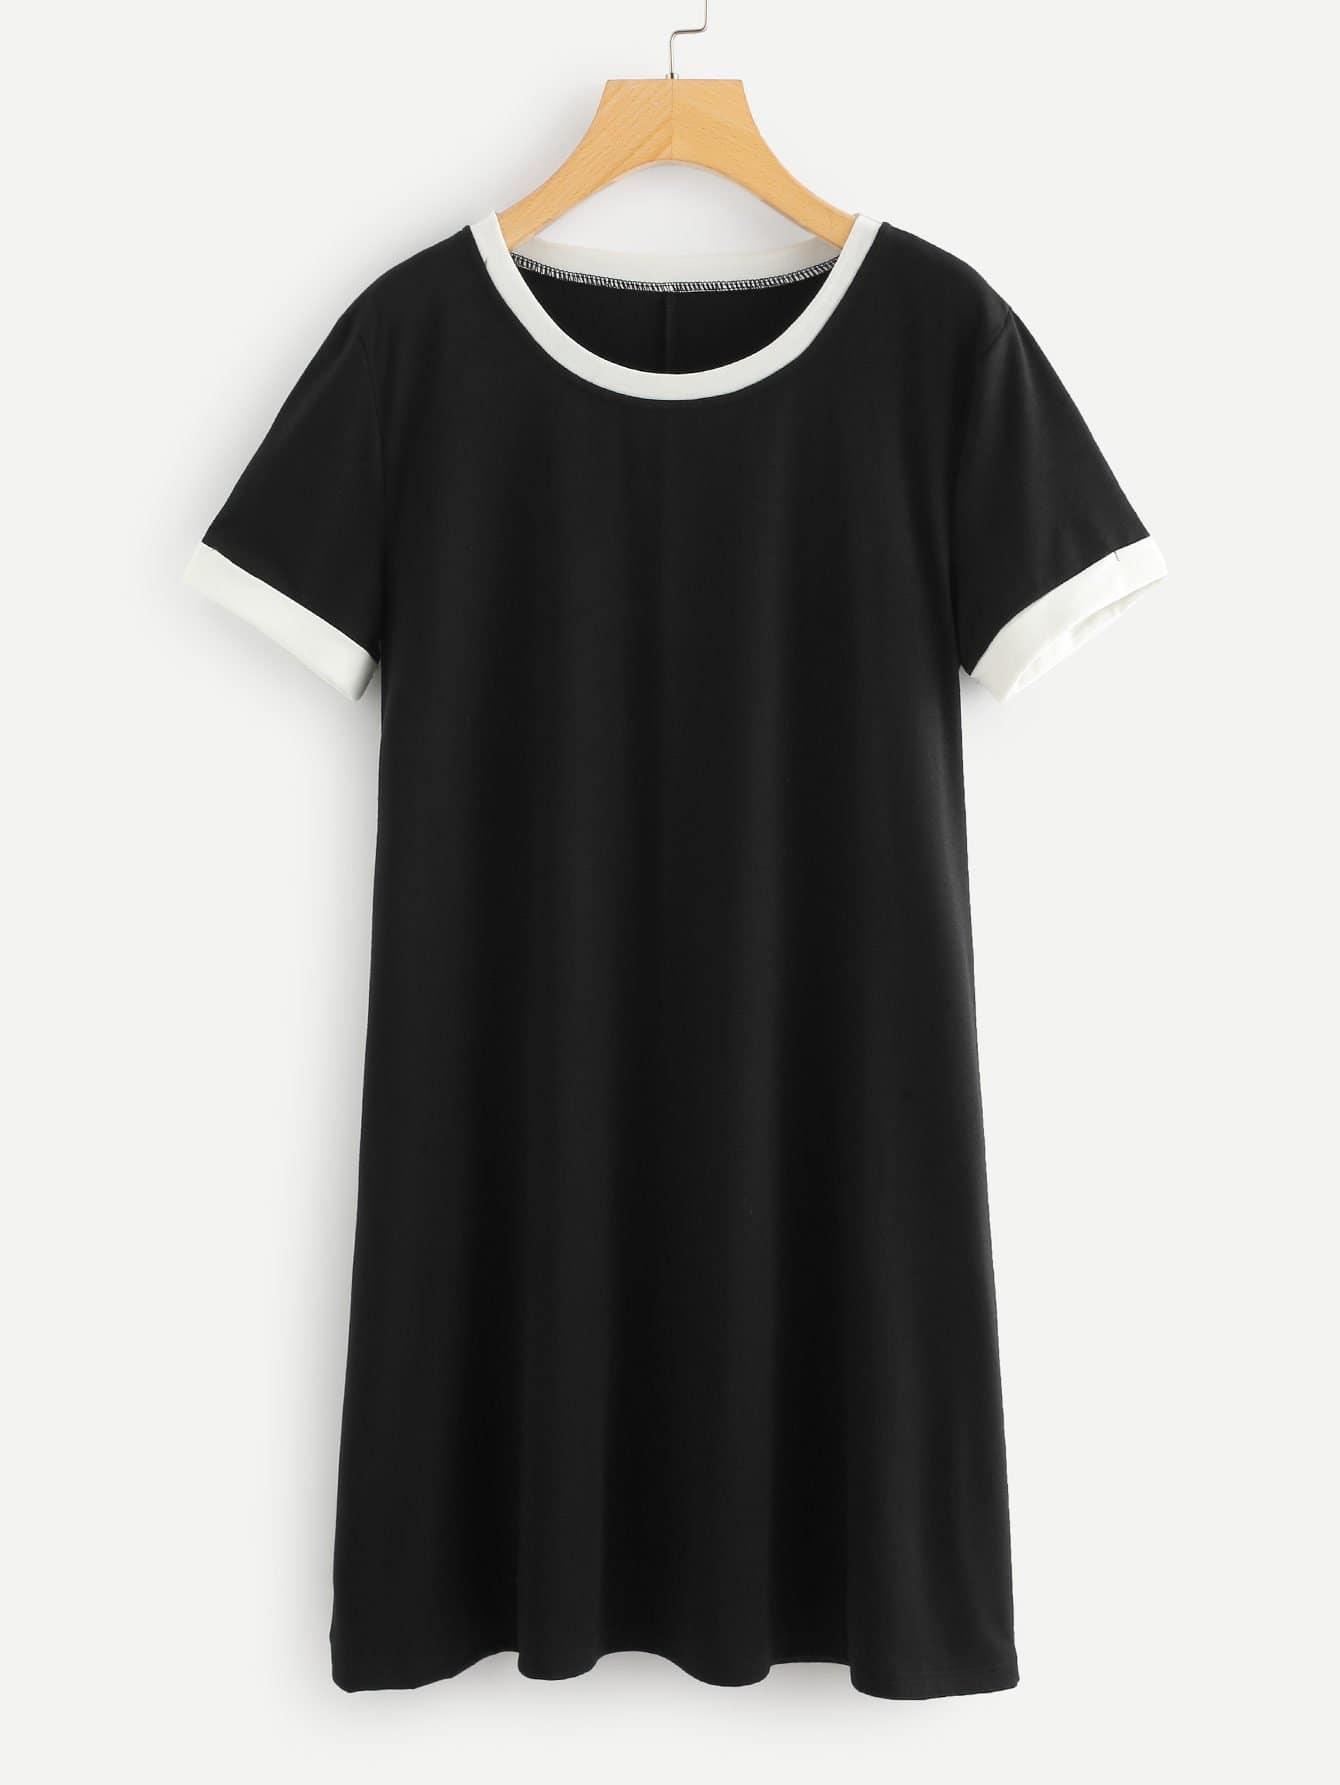 Contrast Trim Tee Dress striped contrast trim drop shoulder tee dress